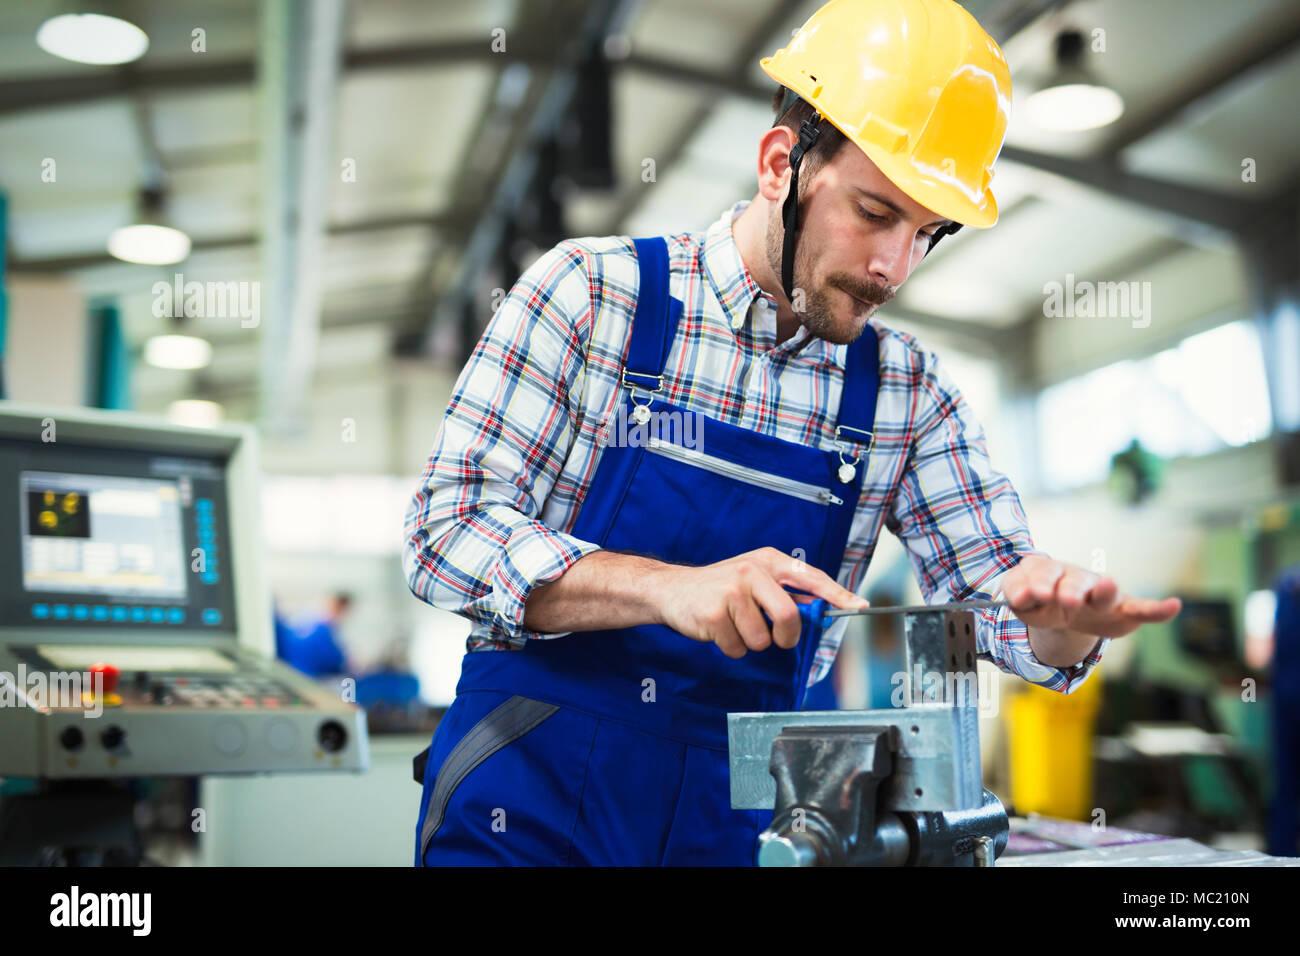 Metal industry factory worker working on metal parts Stock Photo